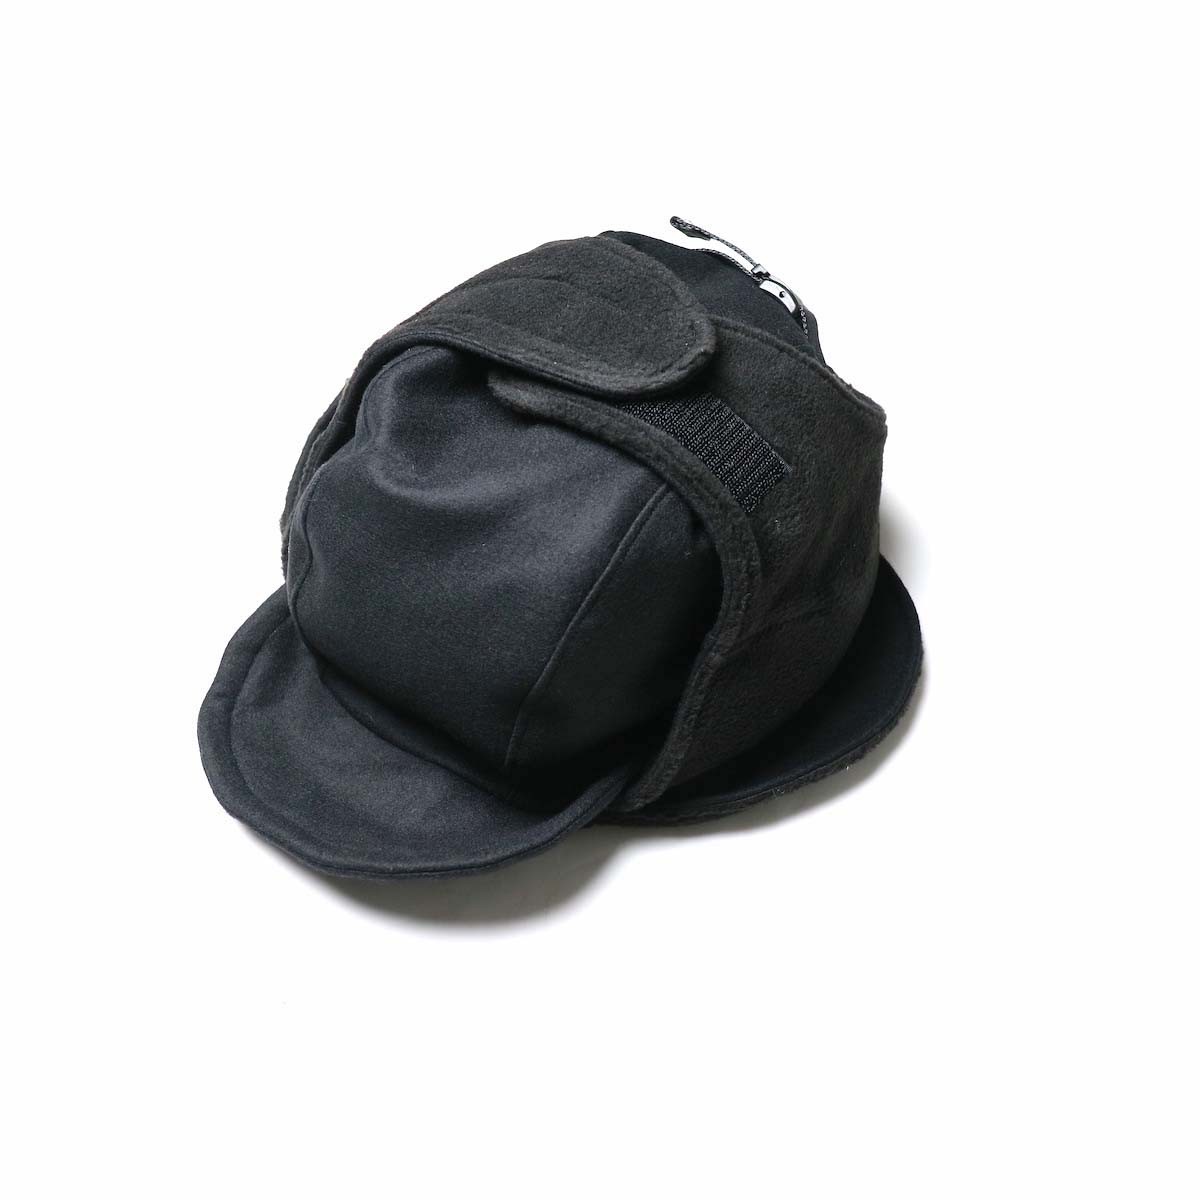 COMESANDGOES / Army Ear Cap (No.17643)